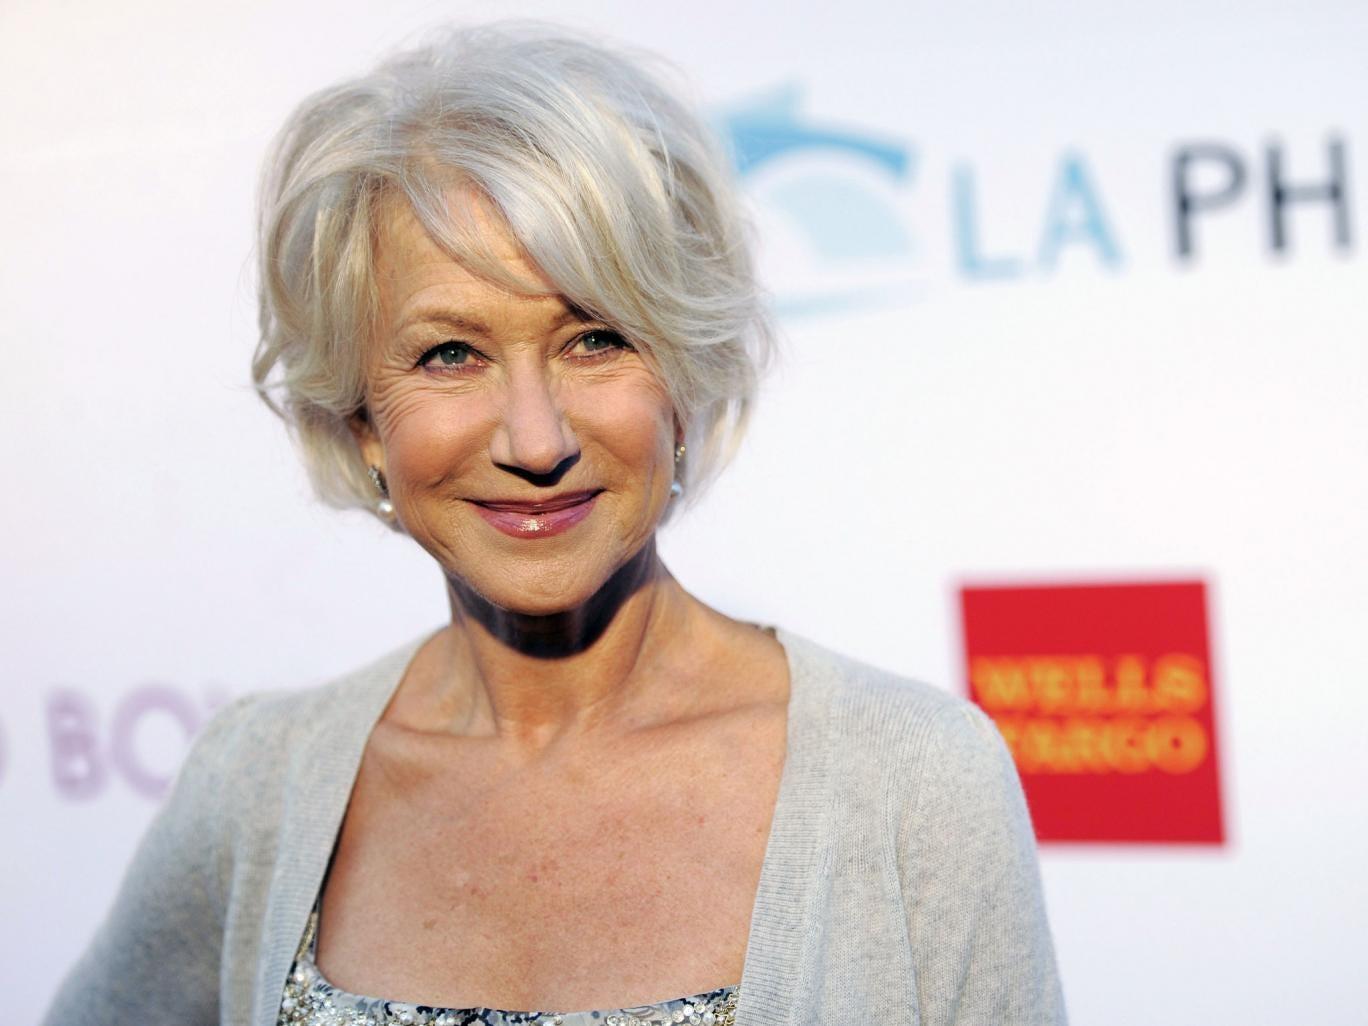 Showbiz royalty: Helen Mirren is ready to bring her Elizabeth II from cinema to stage